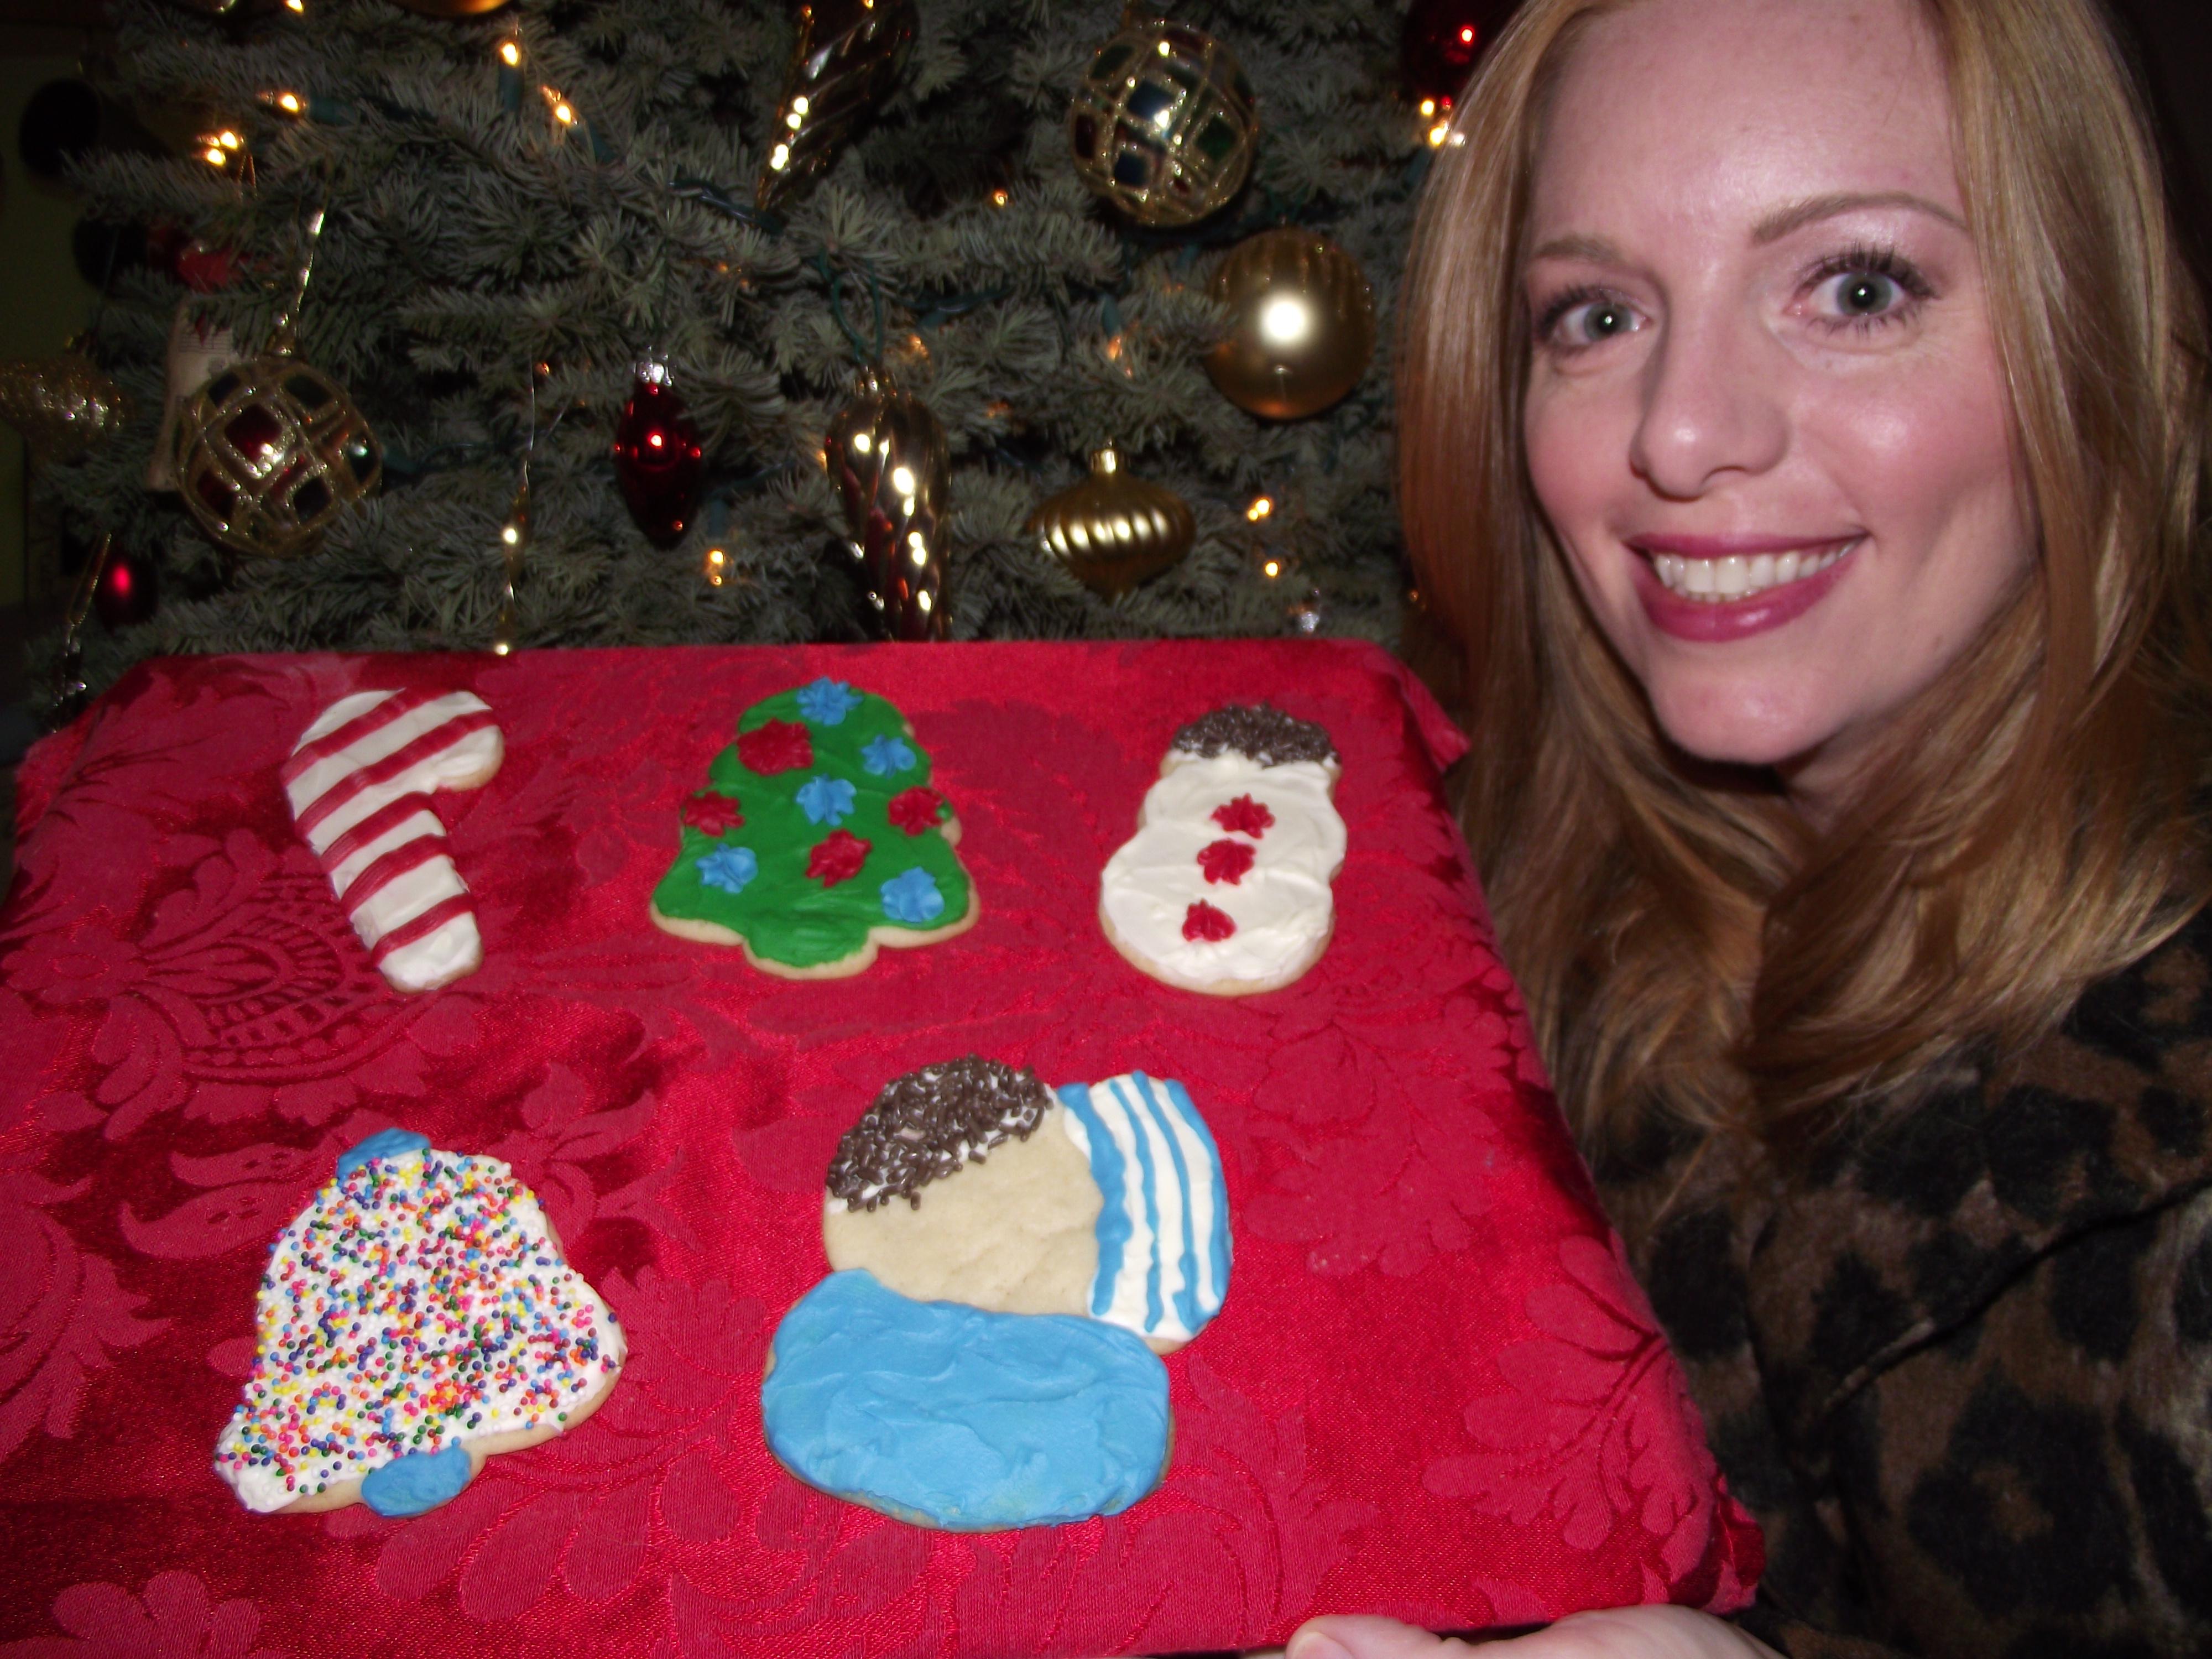 RBC Holiday Photo Contest-Amy Ala